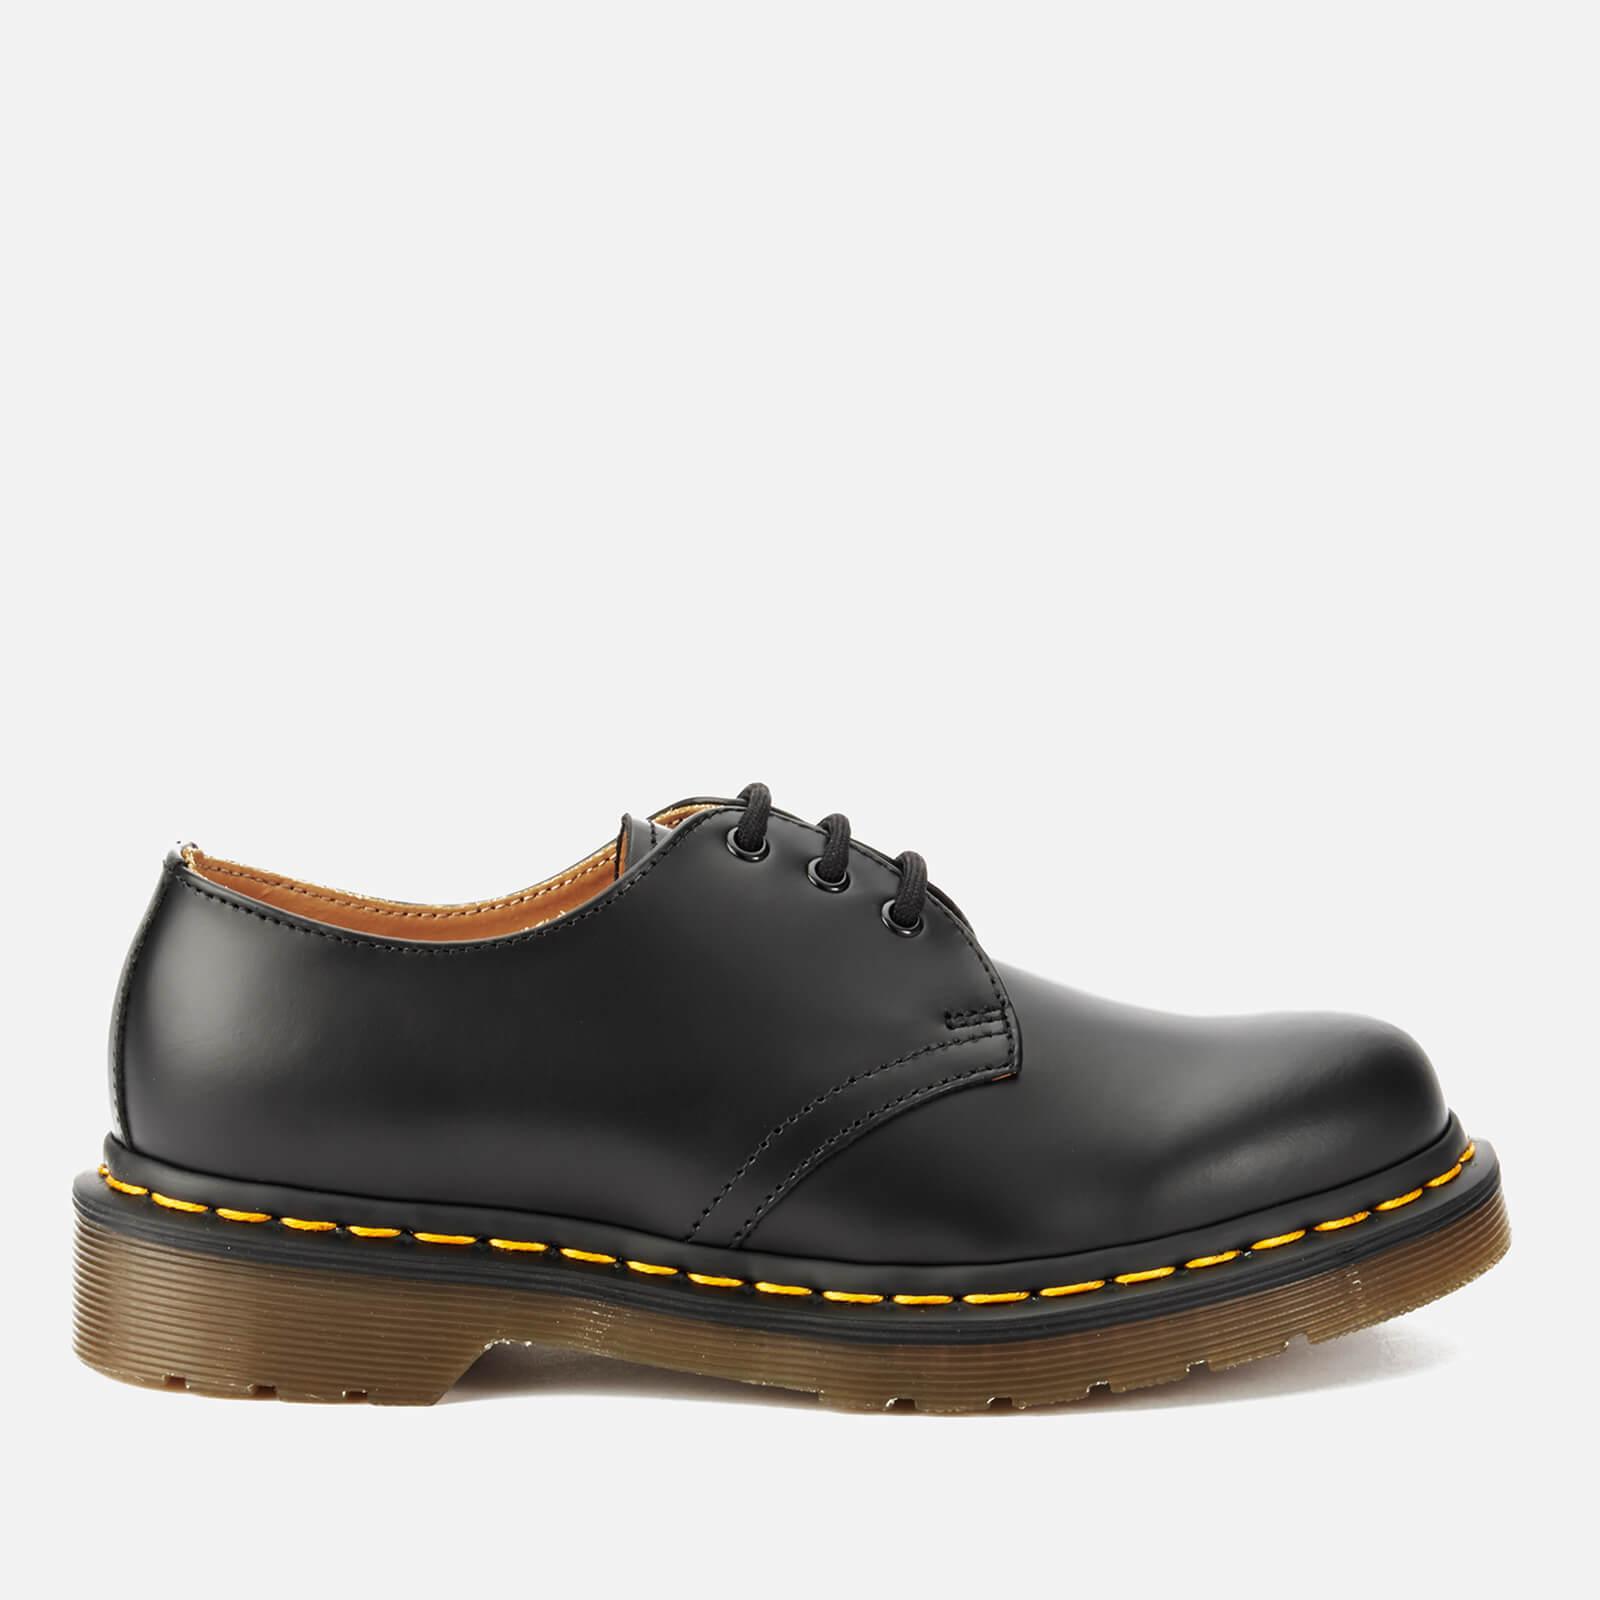 Dr. Martens 1461 Smooth Leather 3-Eye Shoes - Black - UK 7